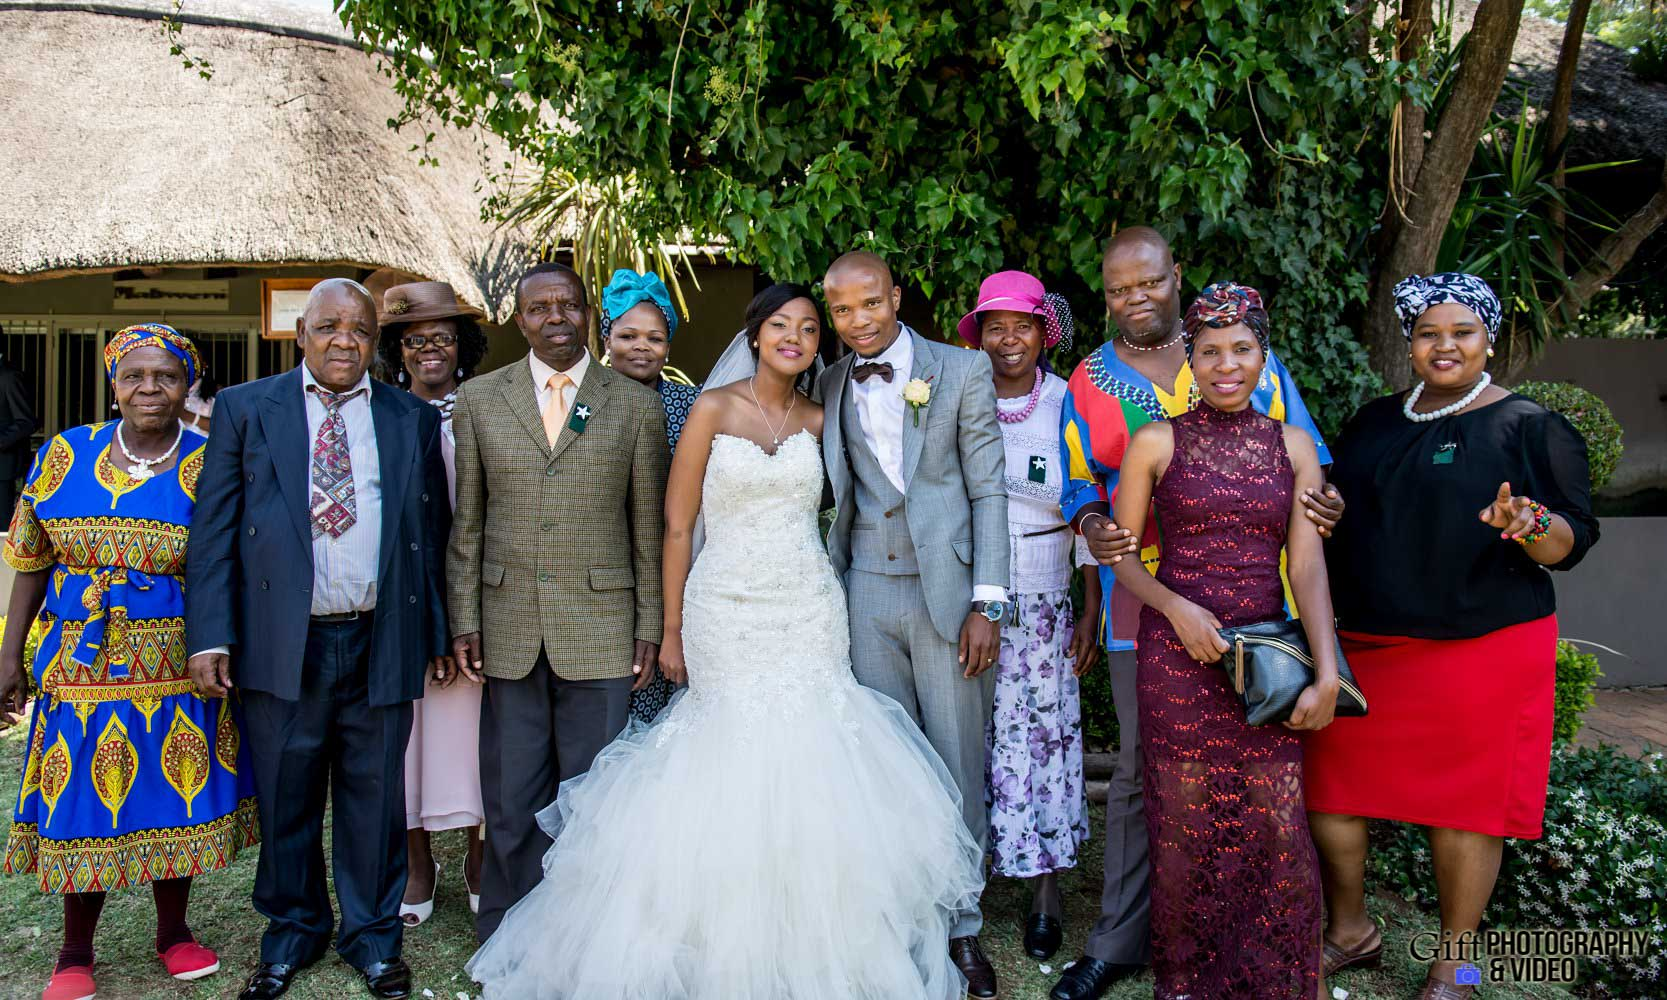 Choene & Sihle Wedding Usambara-41